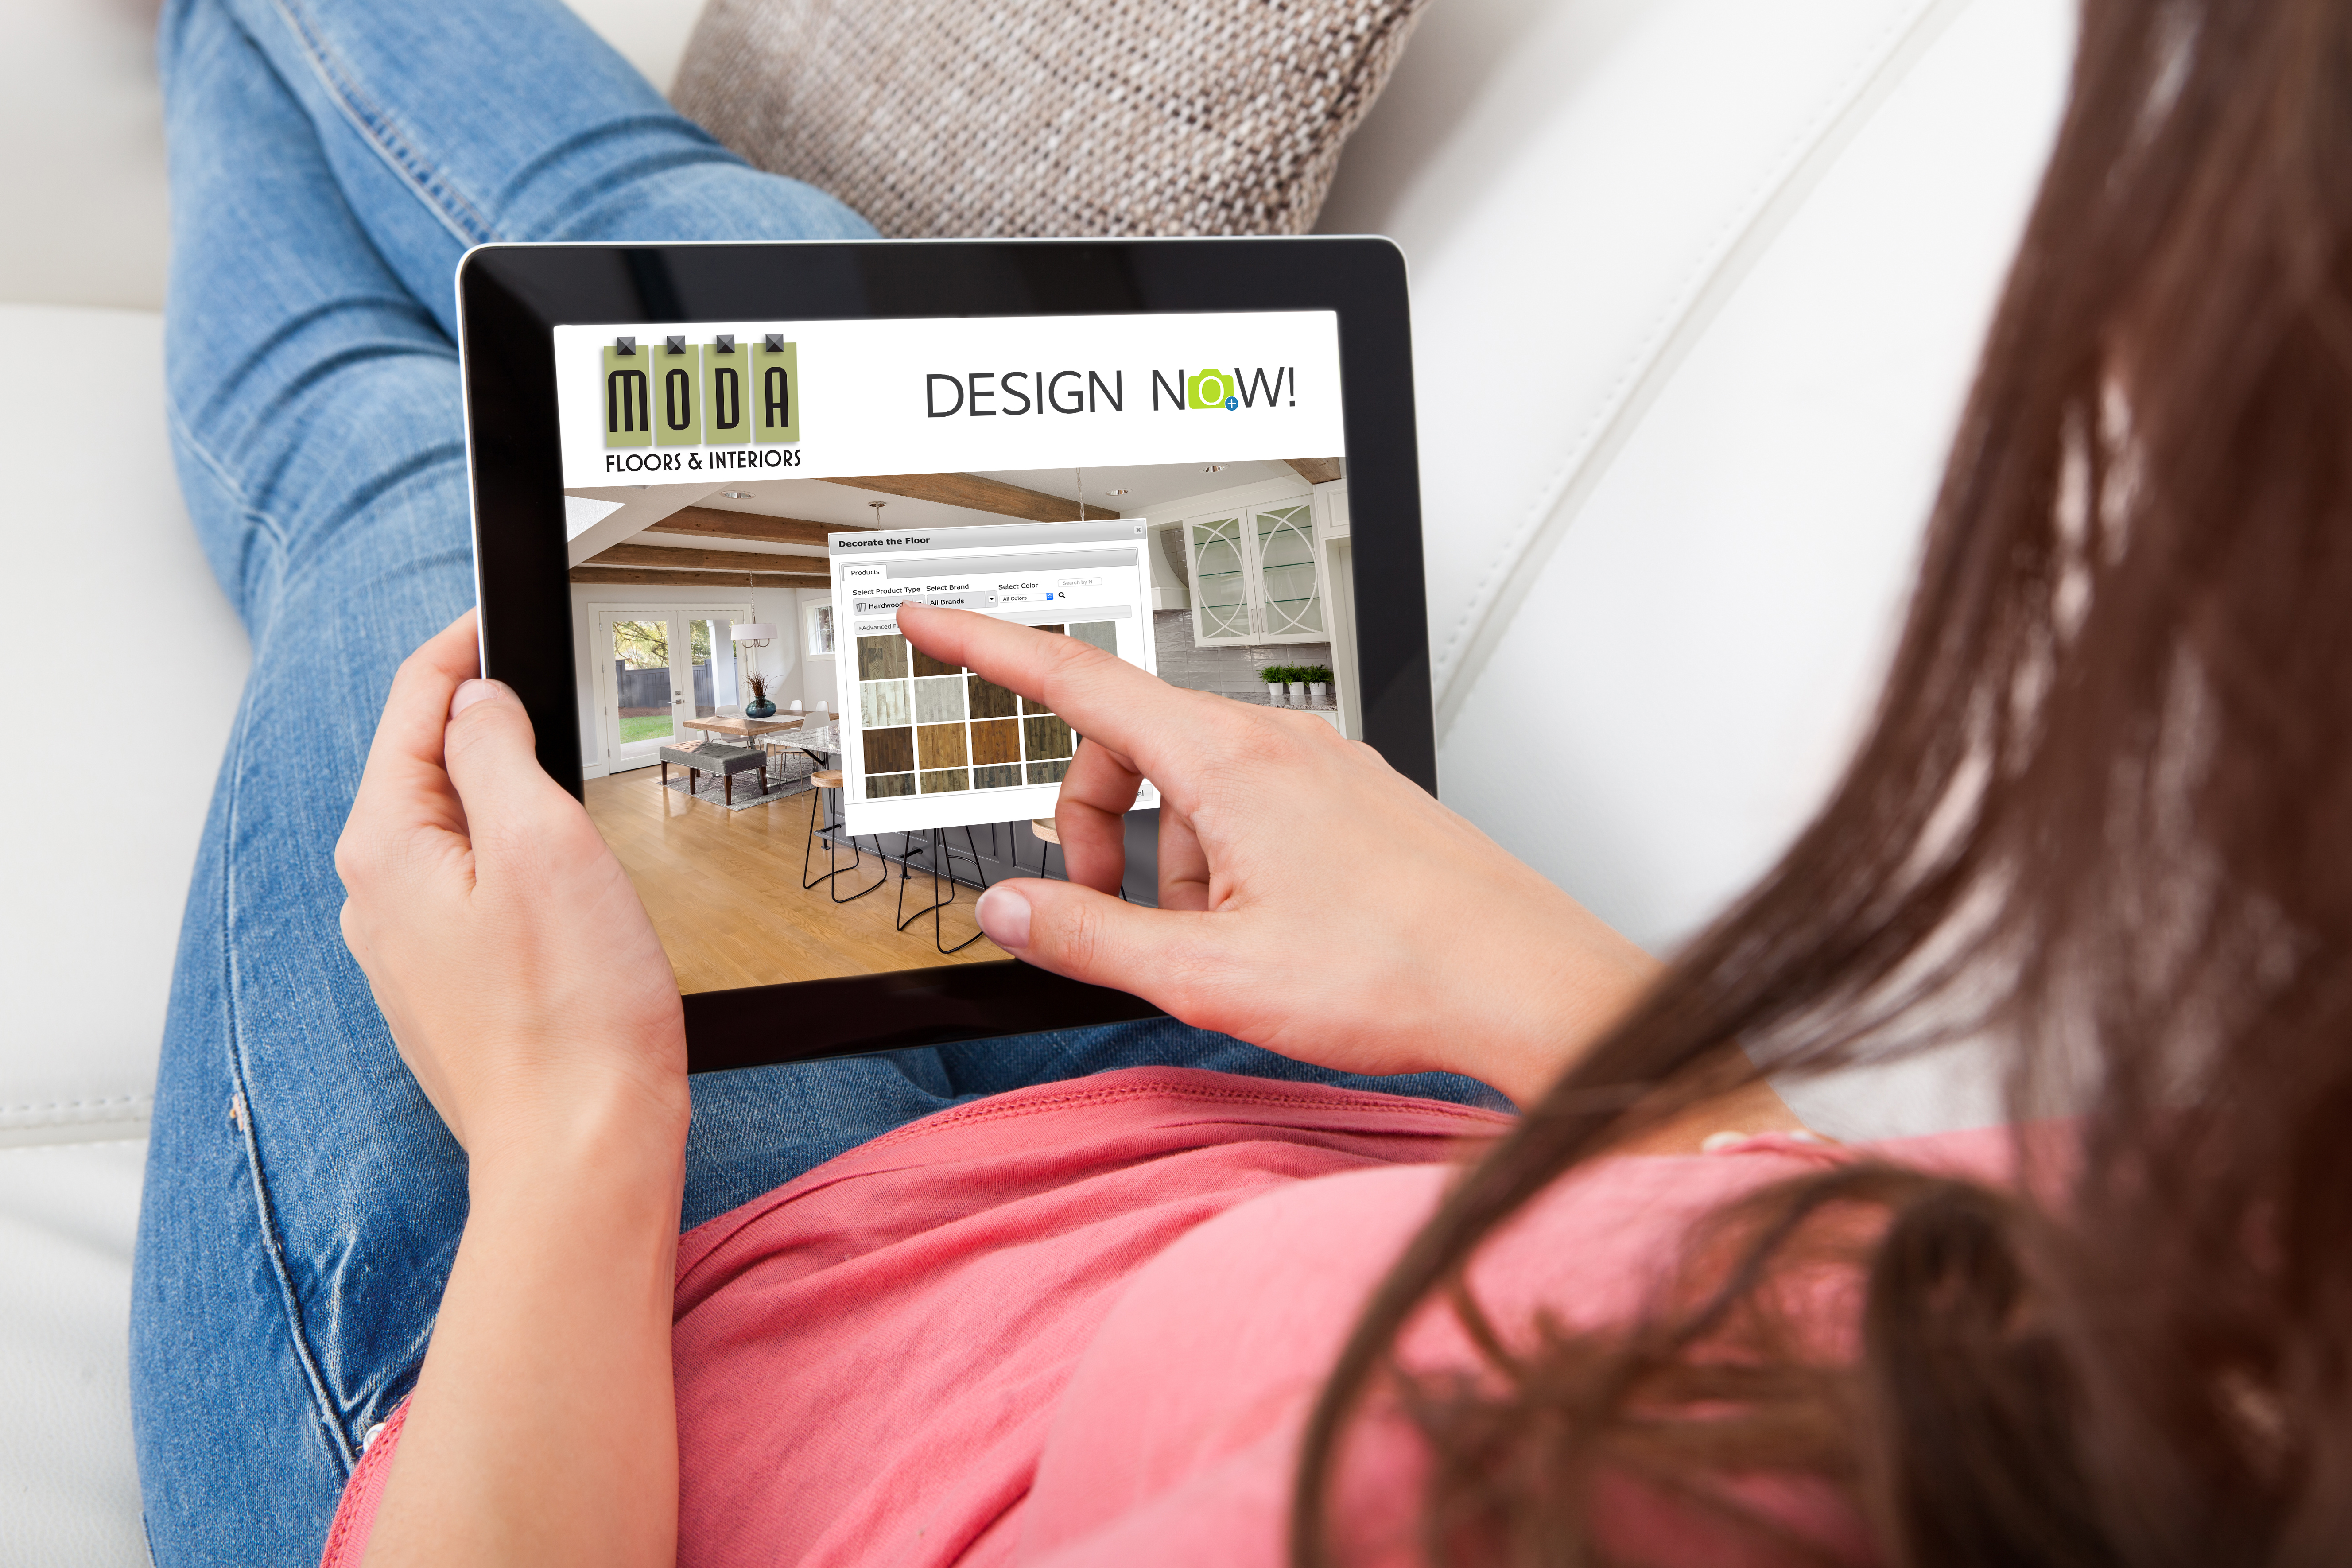 Design Now with Moda